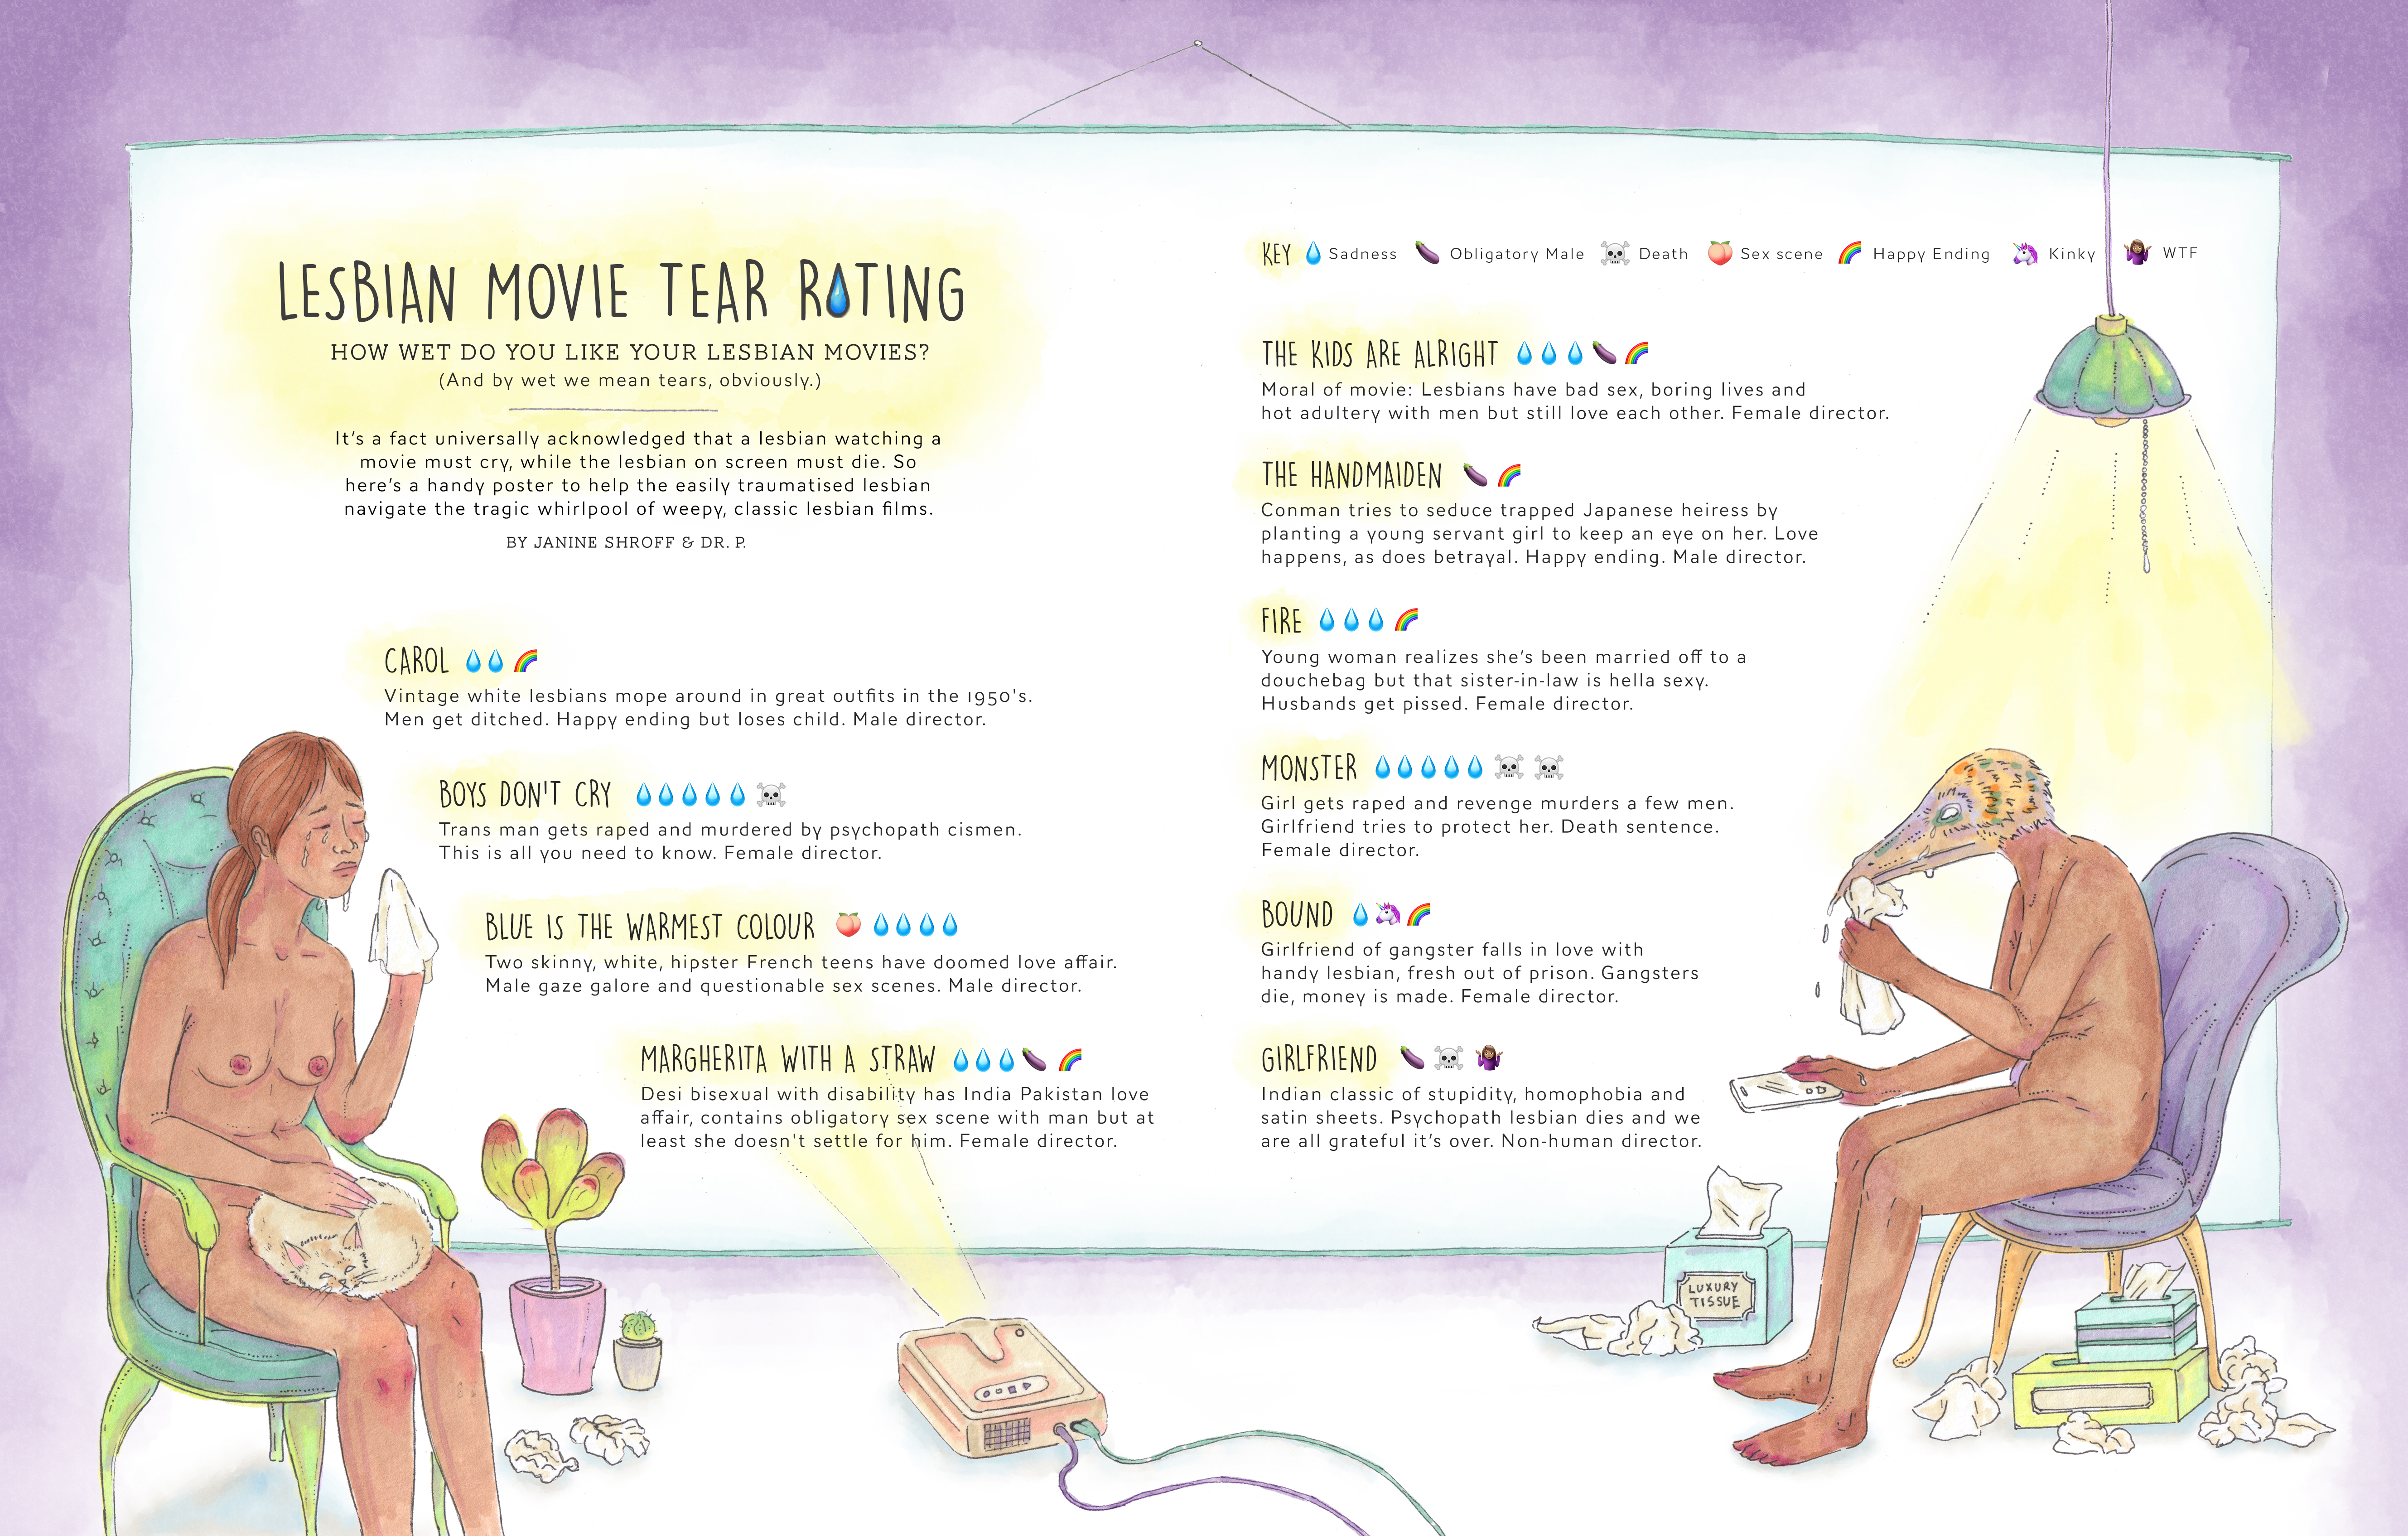 Lesbian Movie Tear Rating v4. Final High res